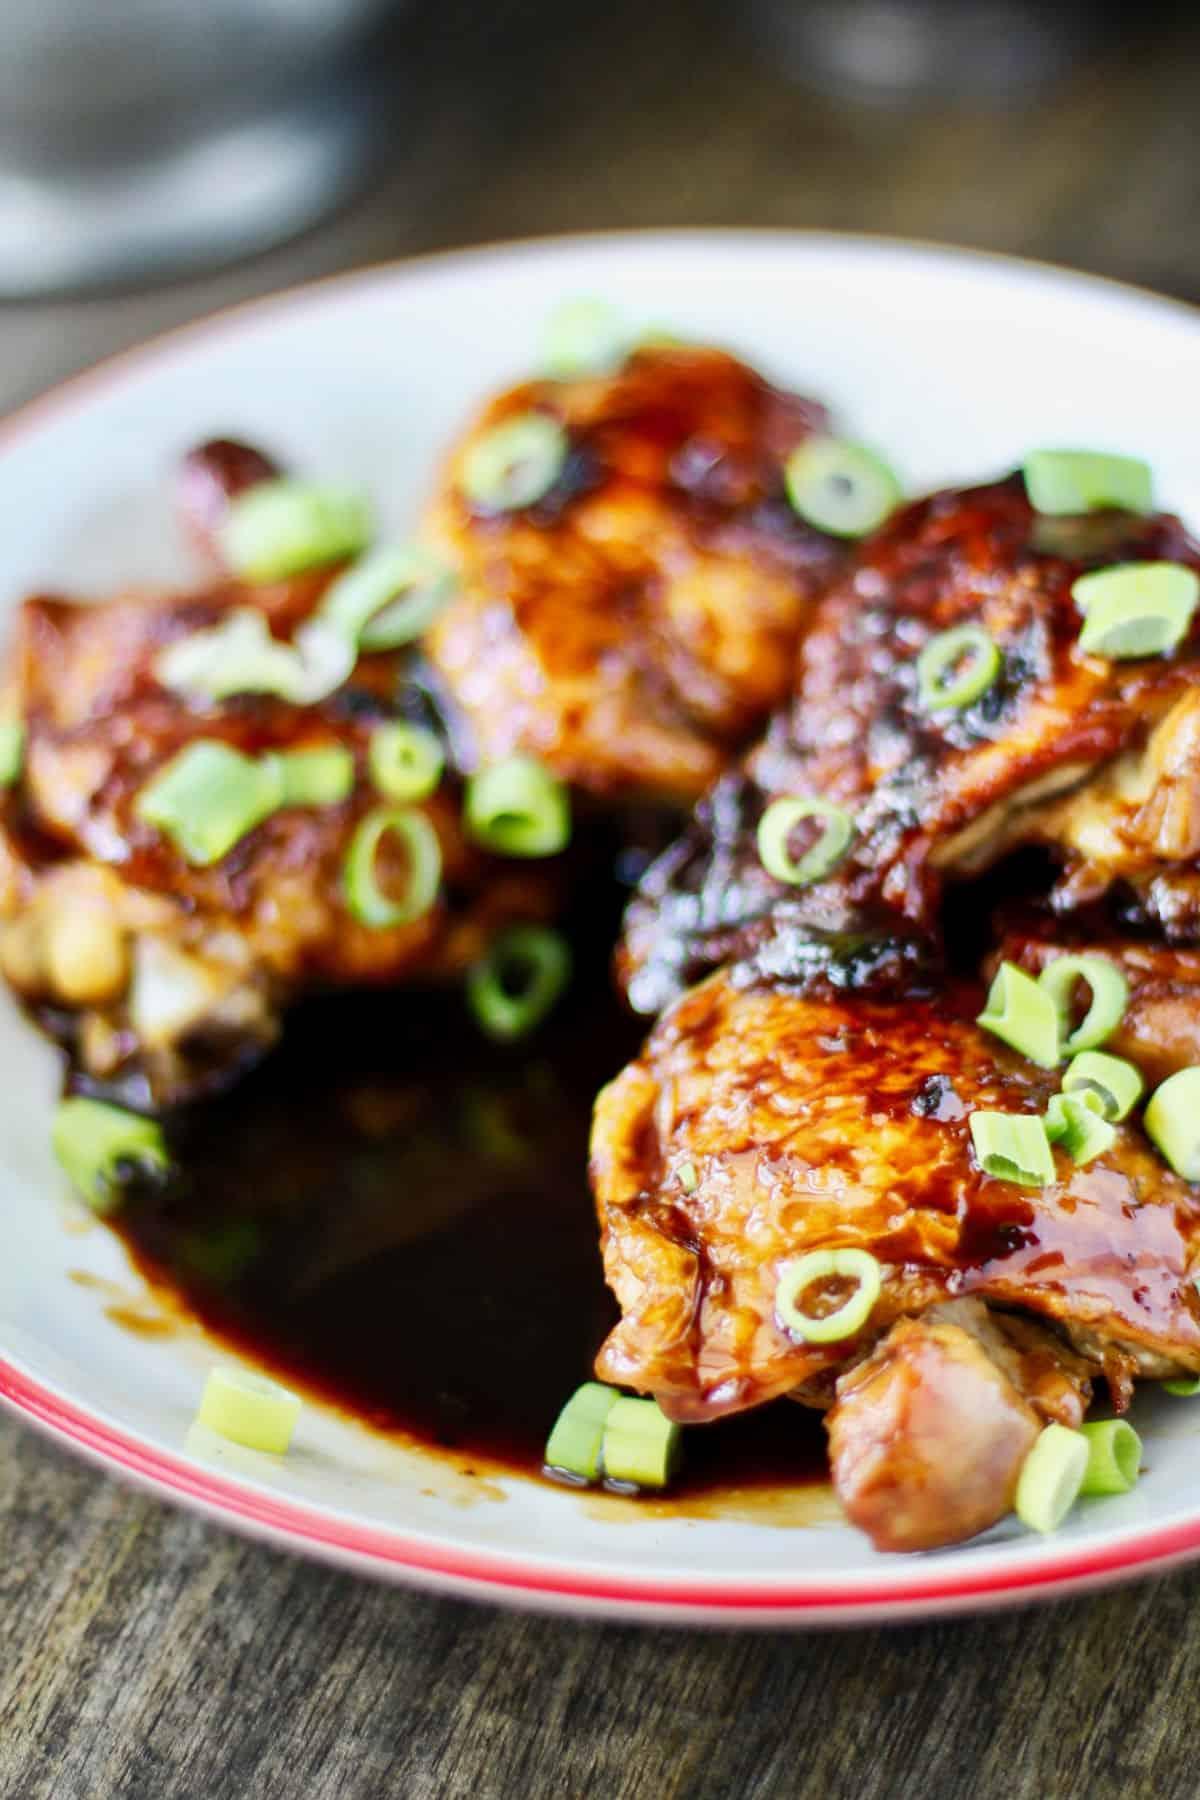 Garlic and Ginger Caramel Chicken Thighs sauce.